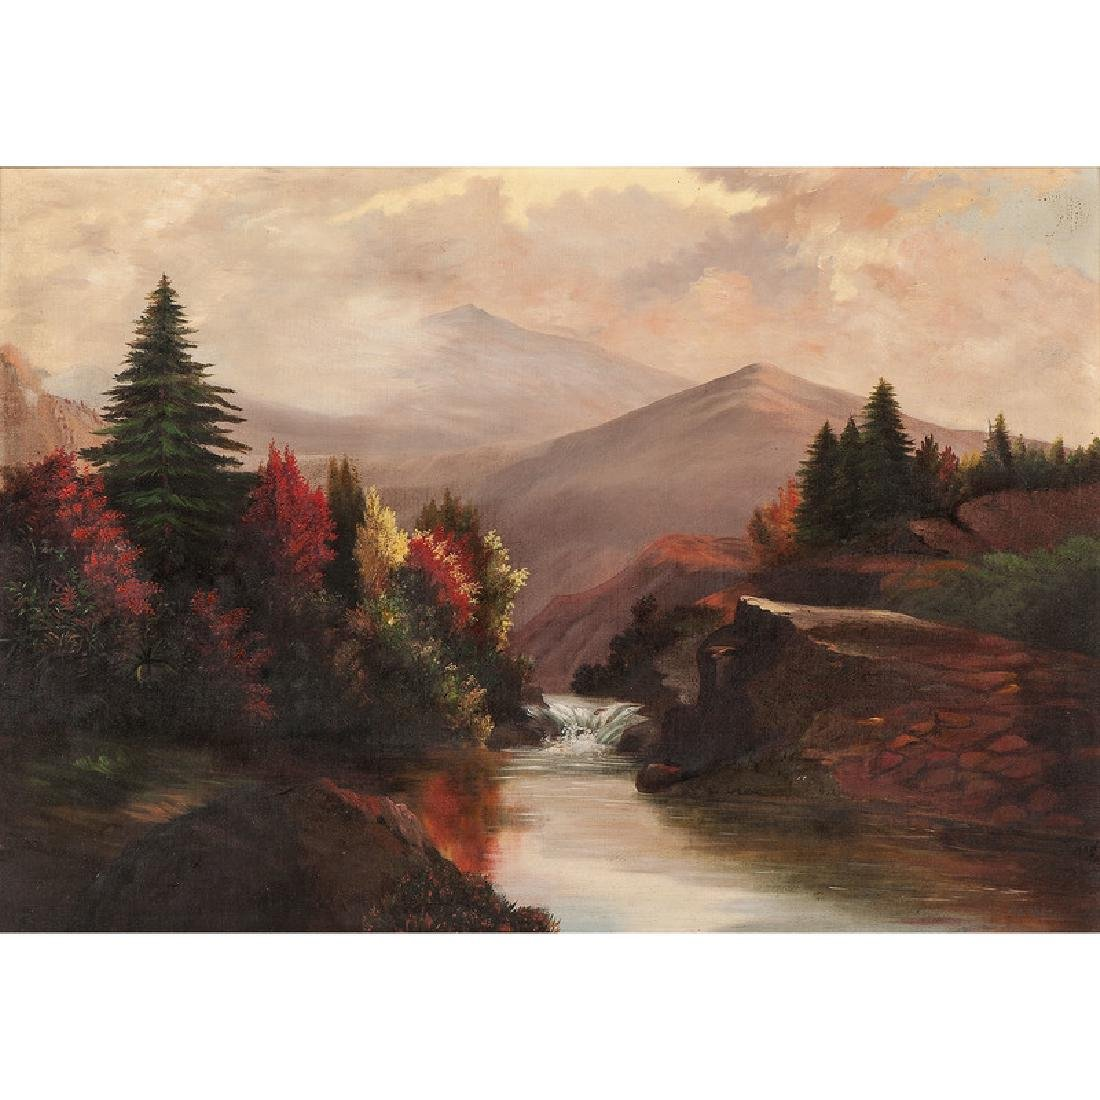 20th-Century Mountain Landscape, Signed Raeburn, Oil on